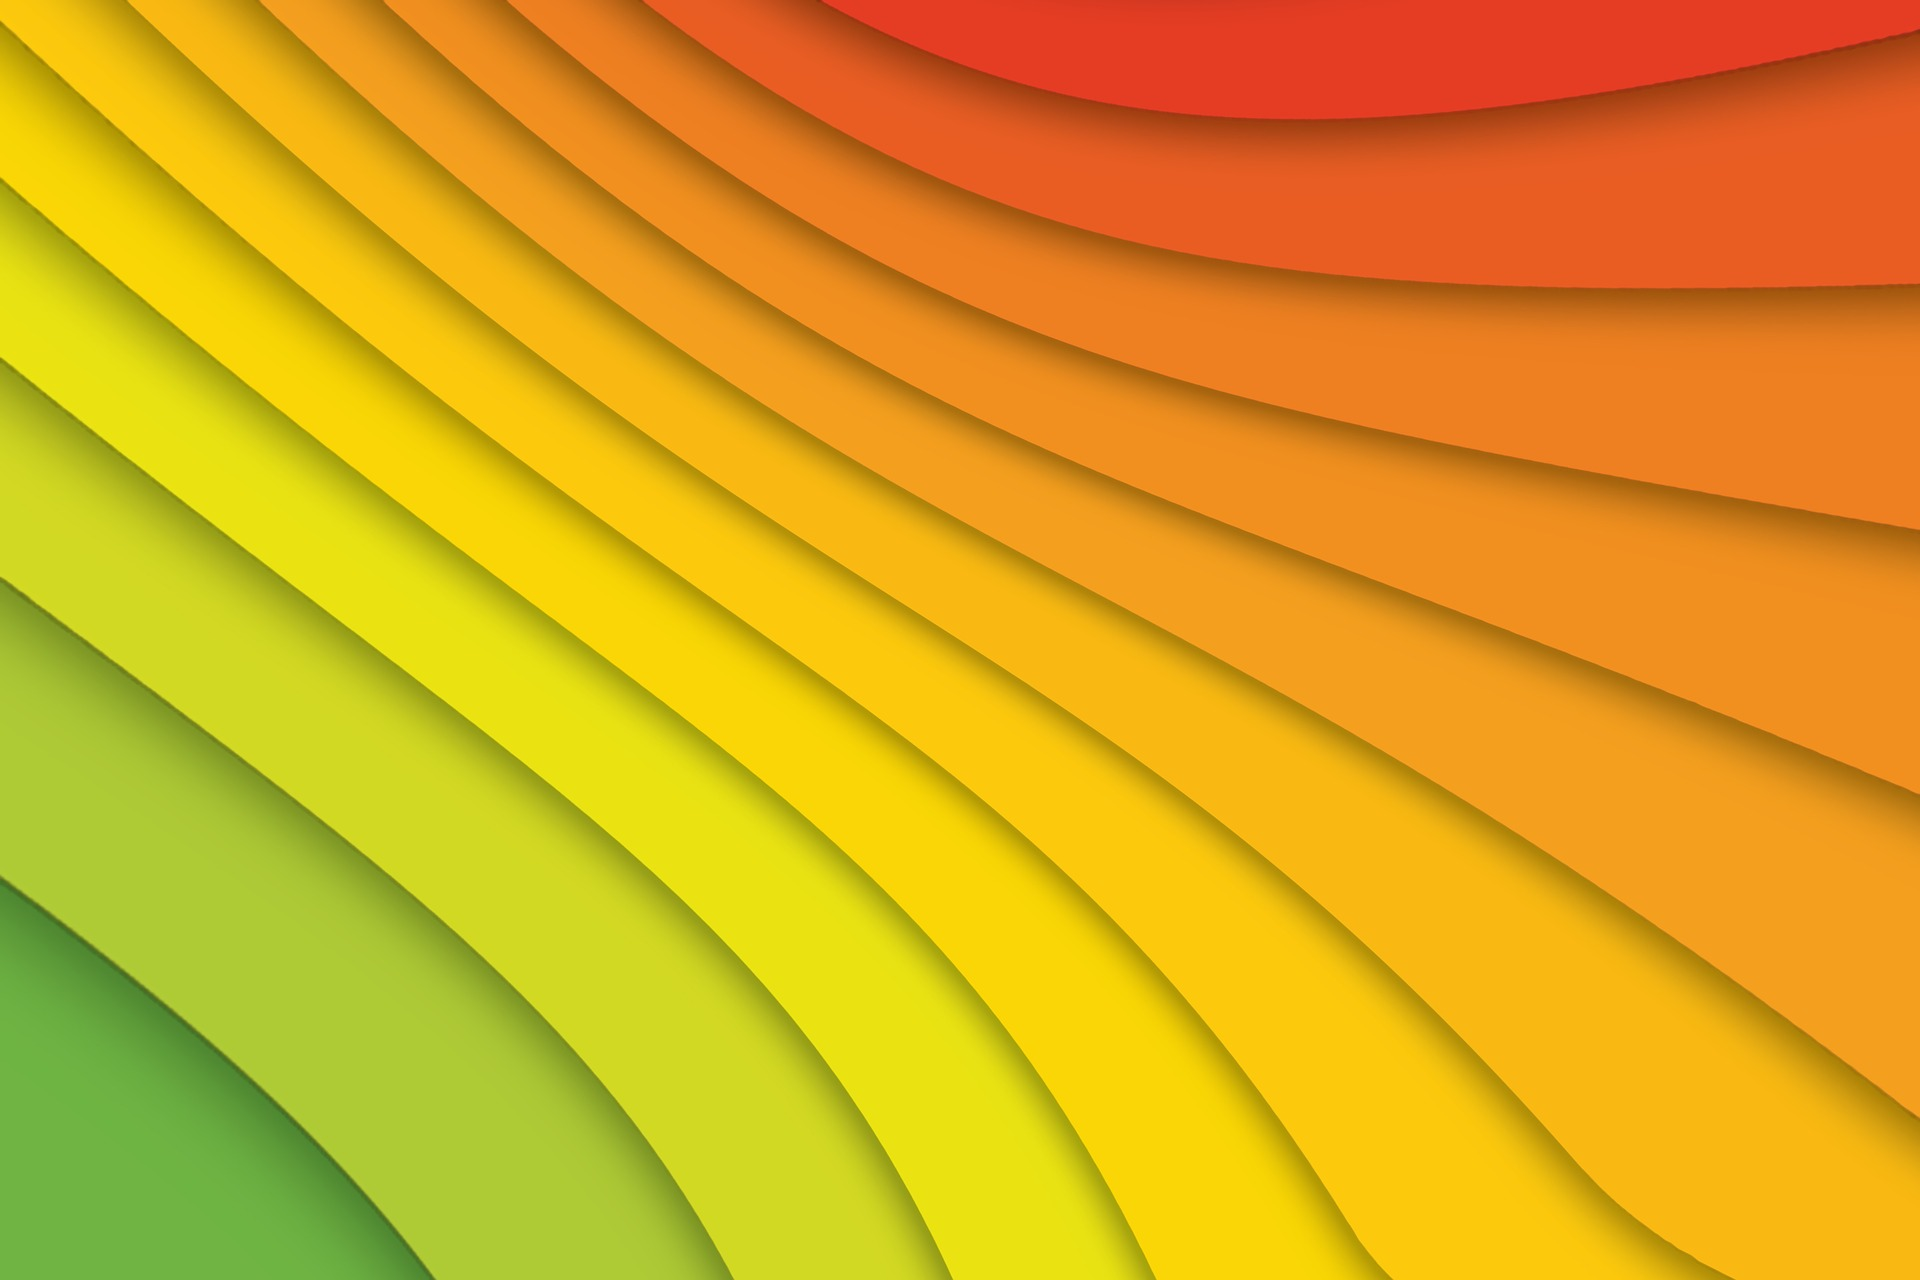 modello, linee, colori, torsión, livelli - Sfondi HD - Professor-falken.com